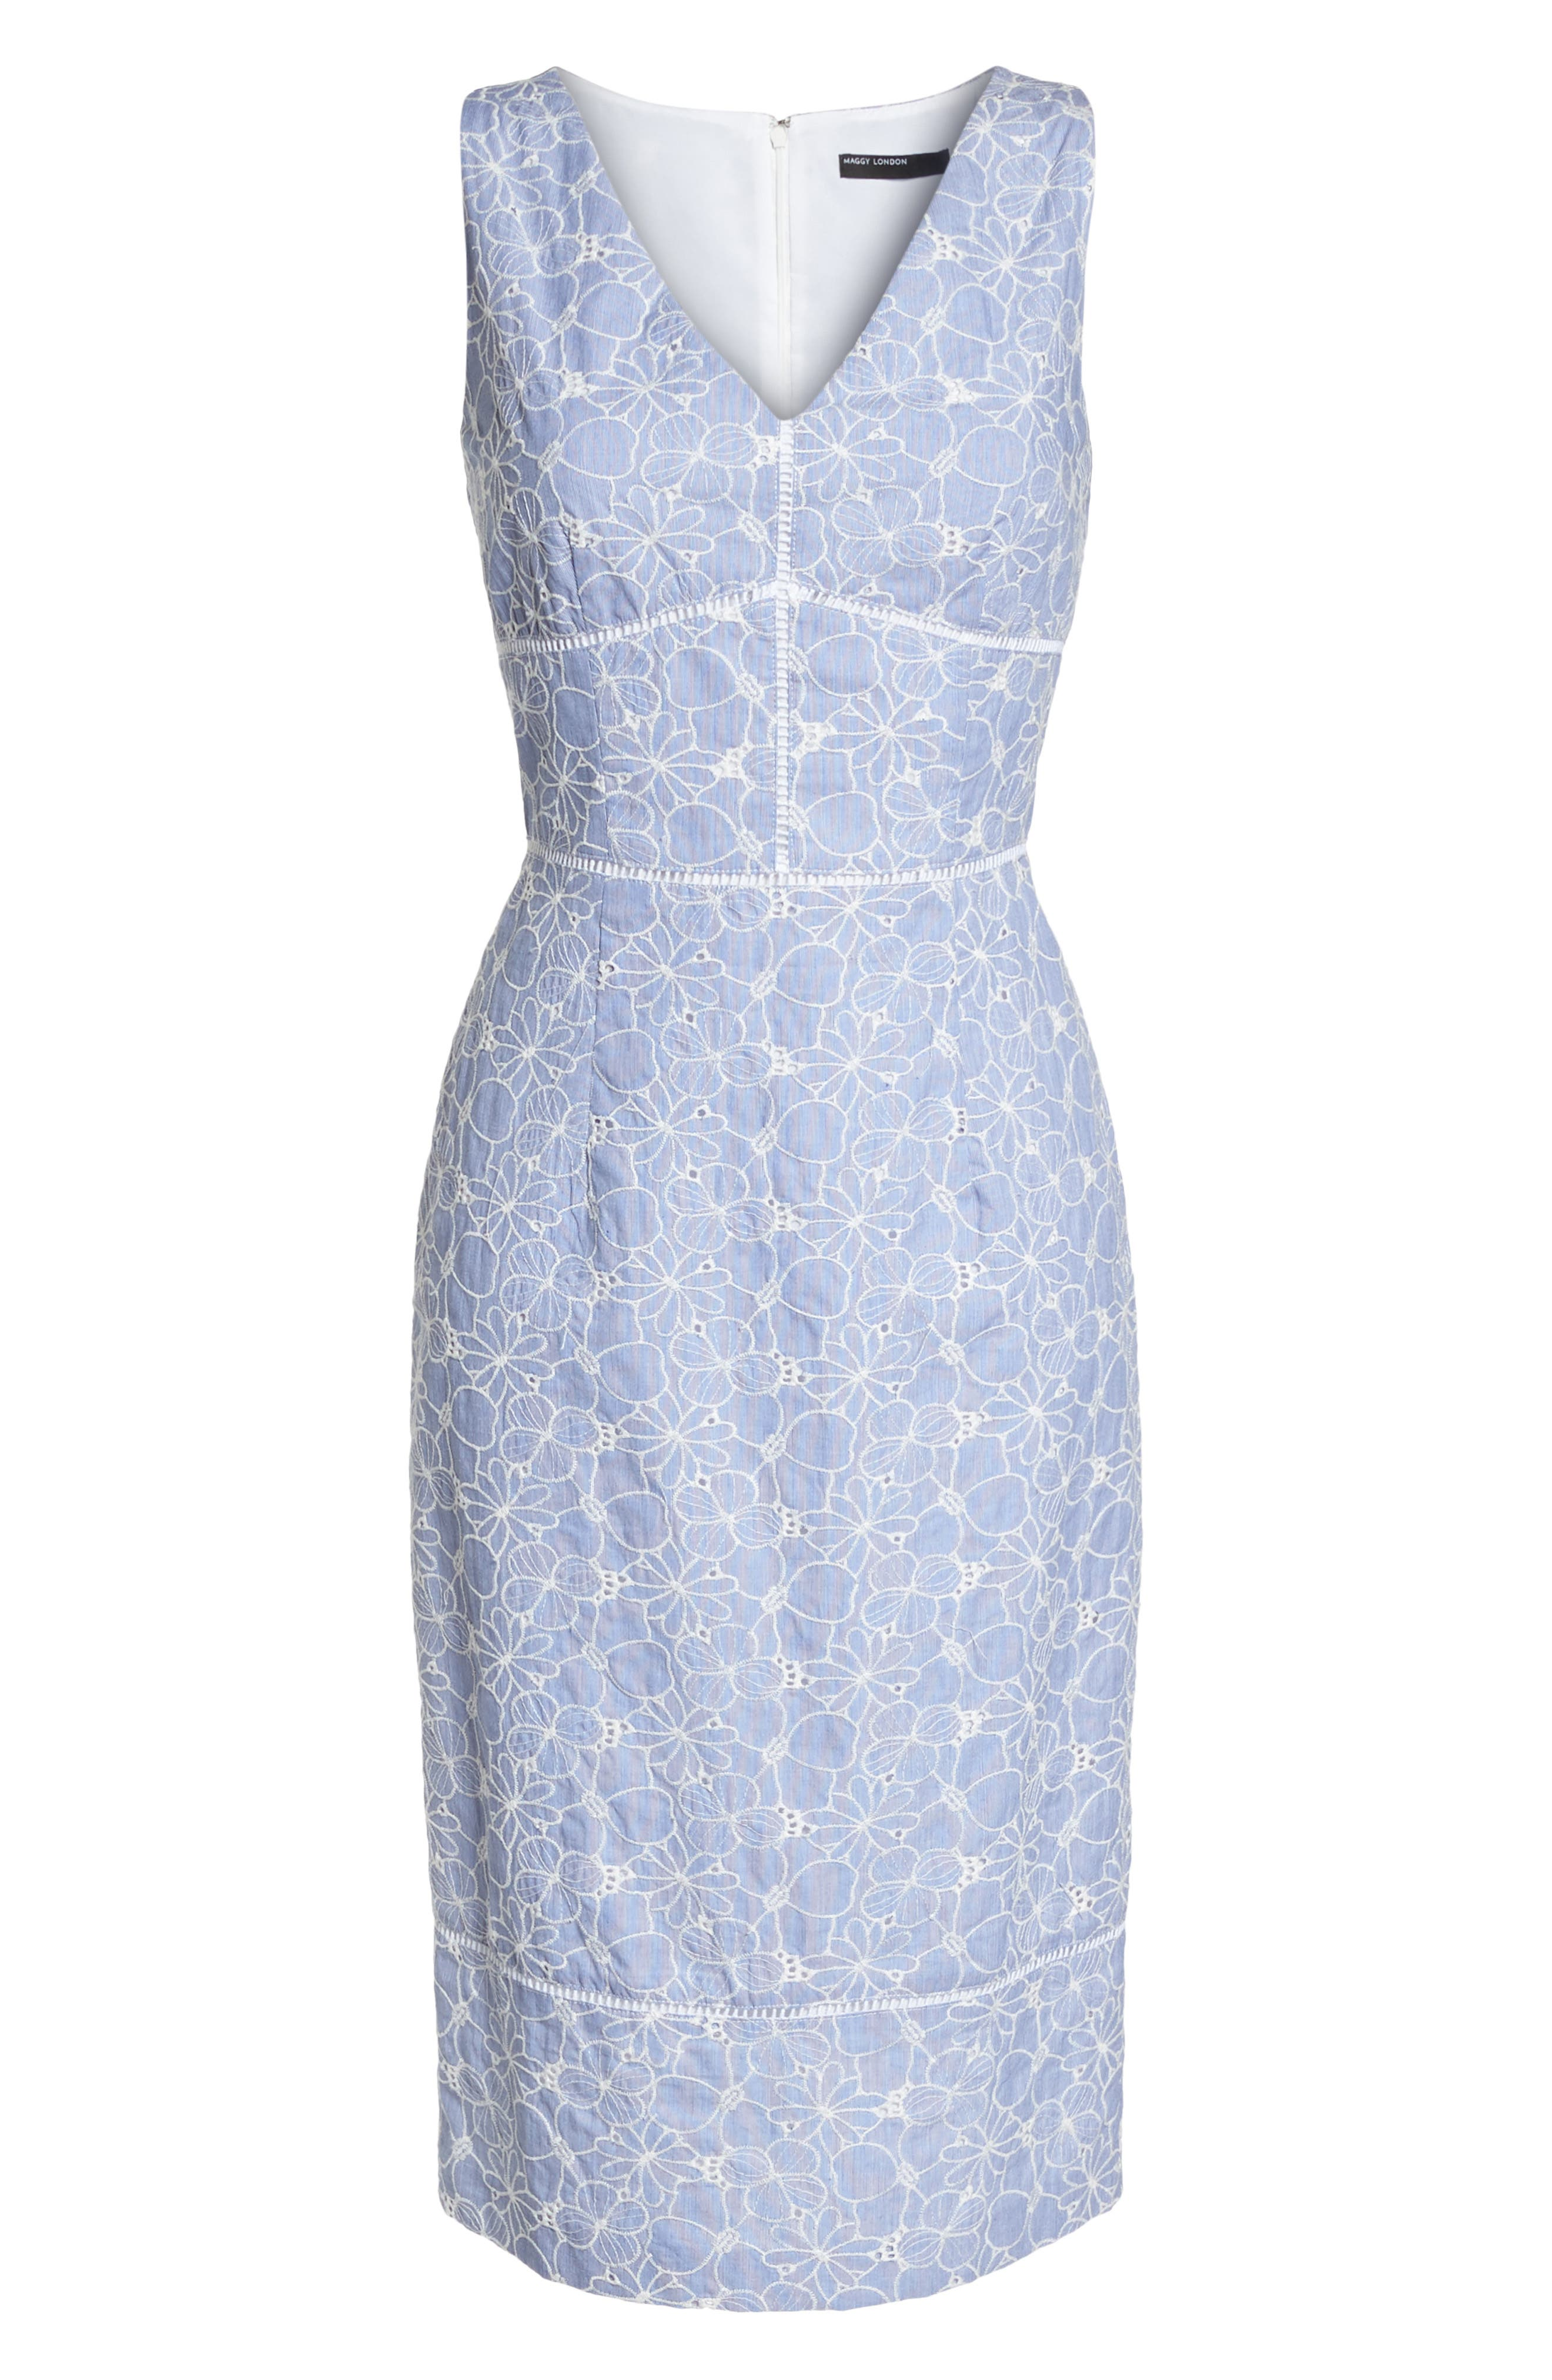 Sleeveless Embroidered Sheath Dress,                             Alternate thumbnail 7, color,                             425